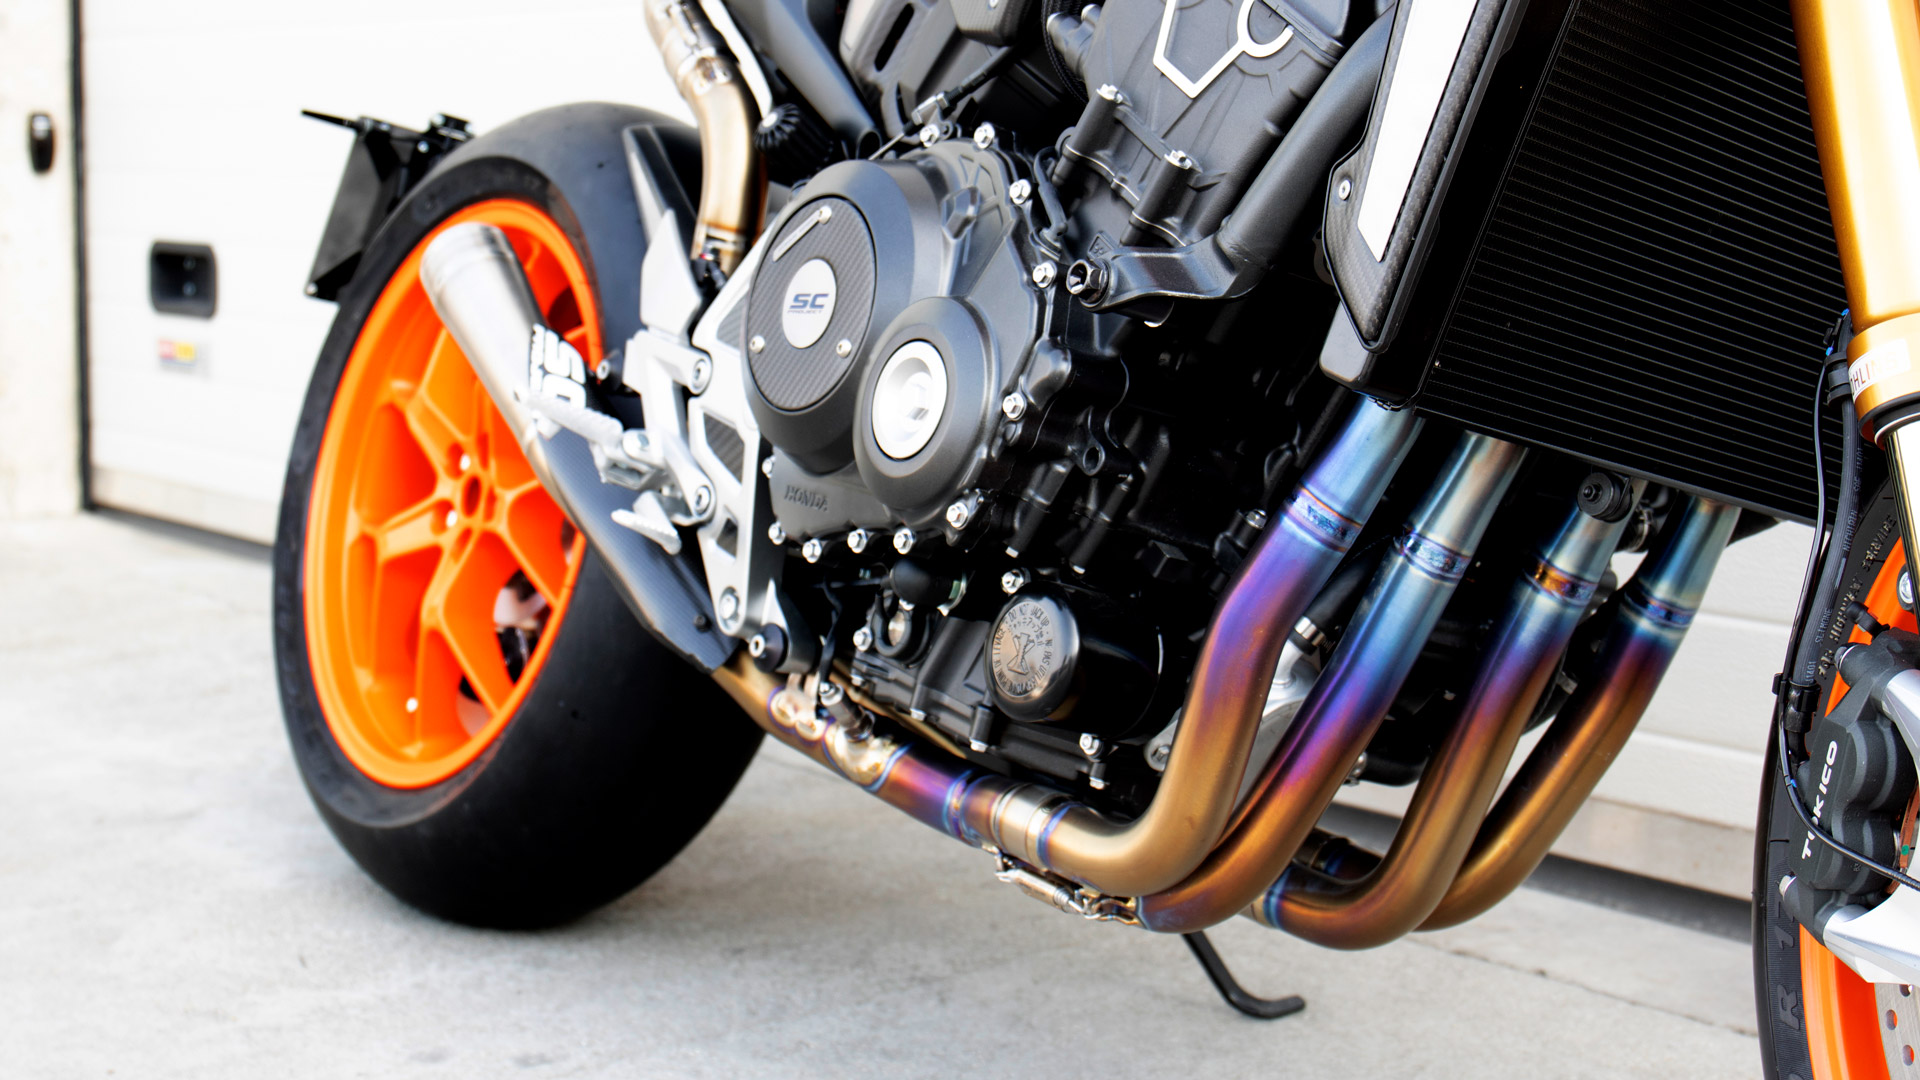 Honda_CB1000R_Dani-Pedrosa_web_001_1920x1080